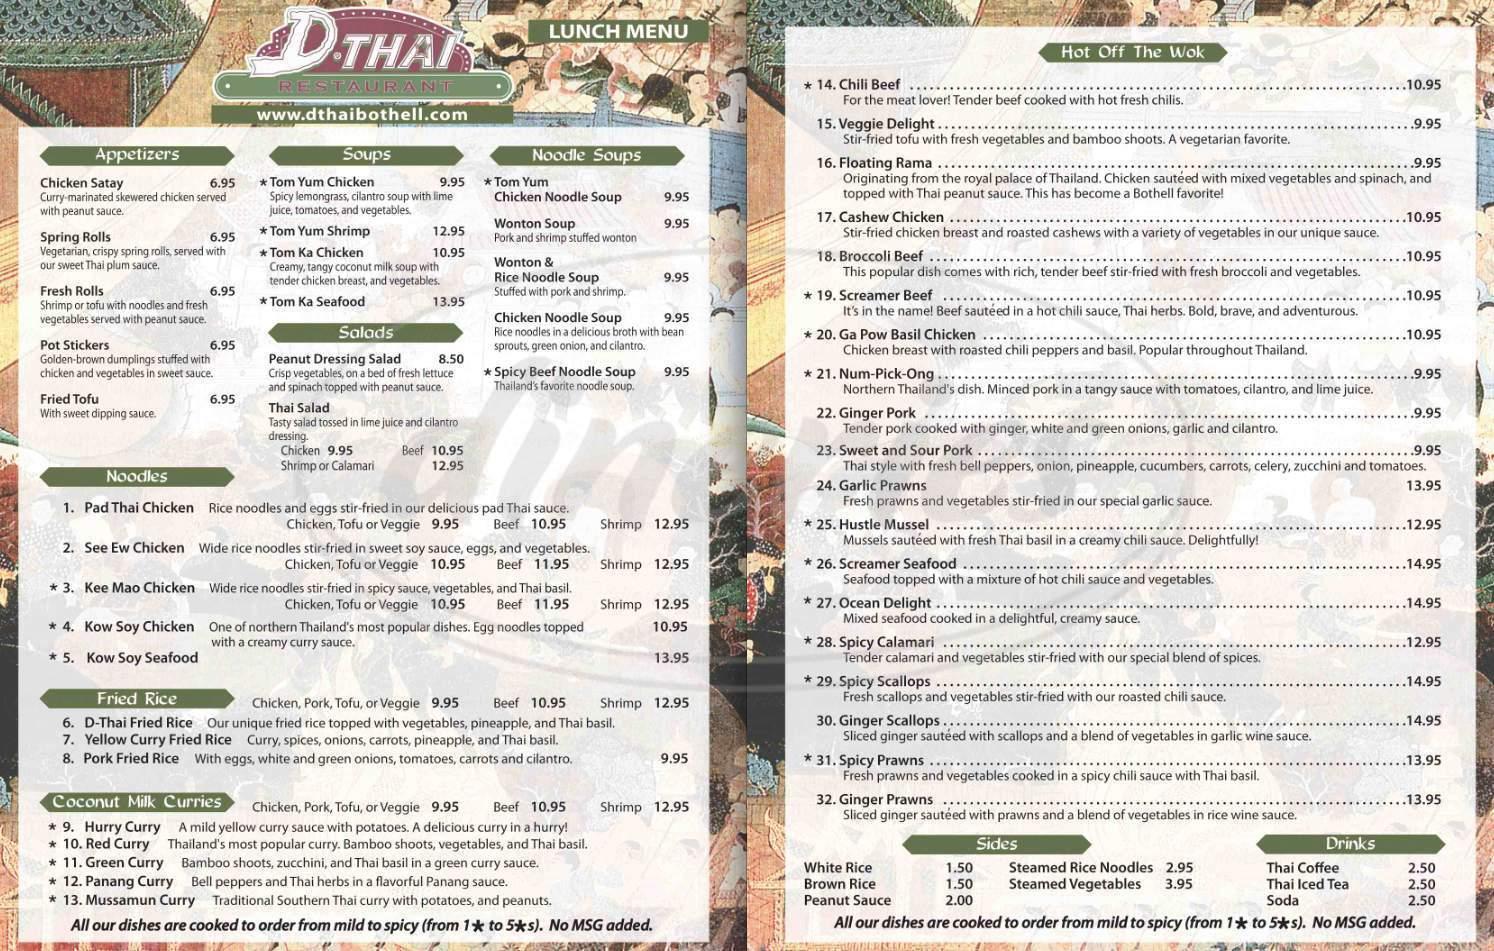 menu for D-Thai Restaurant